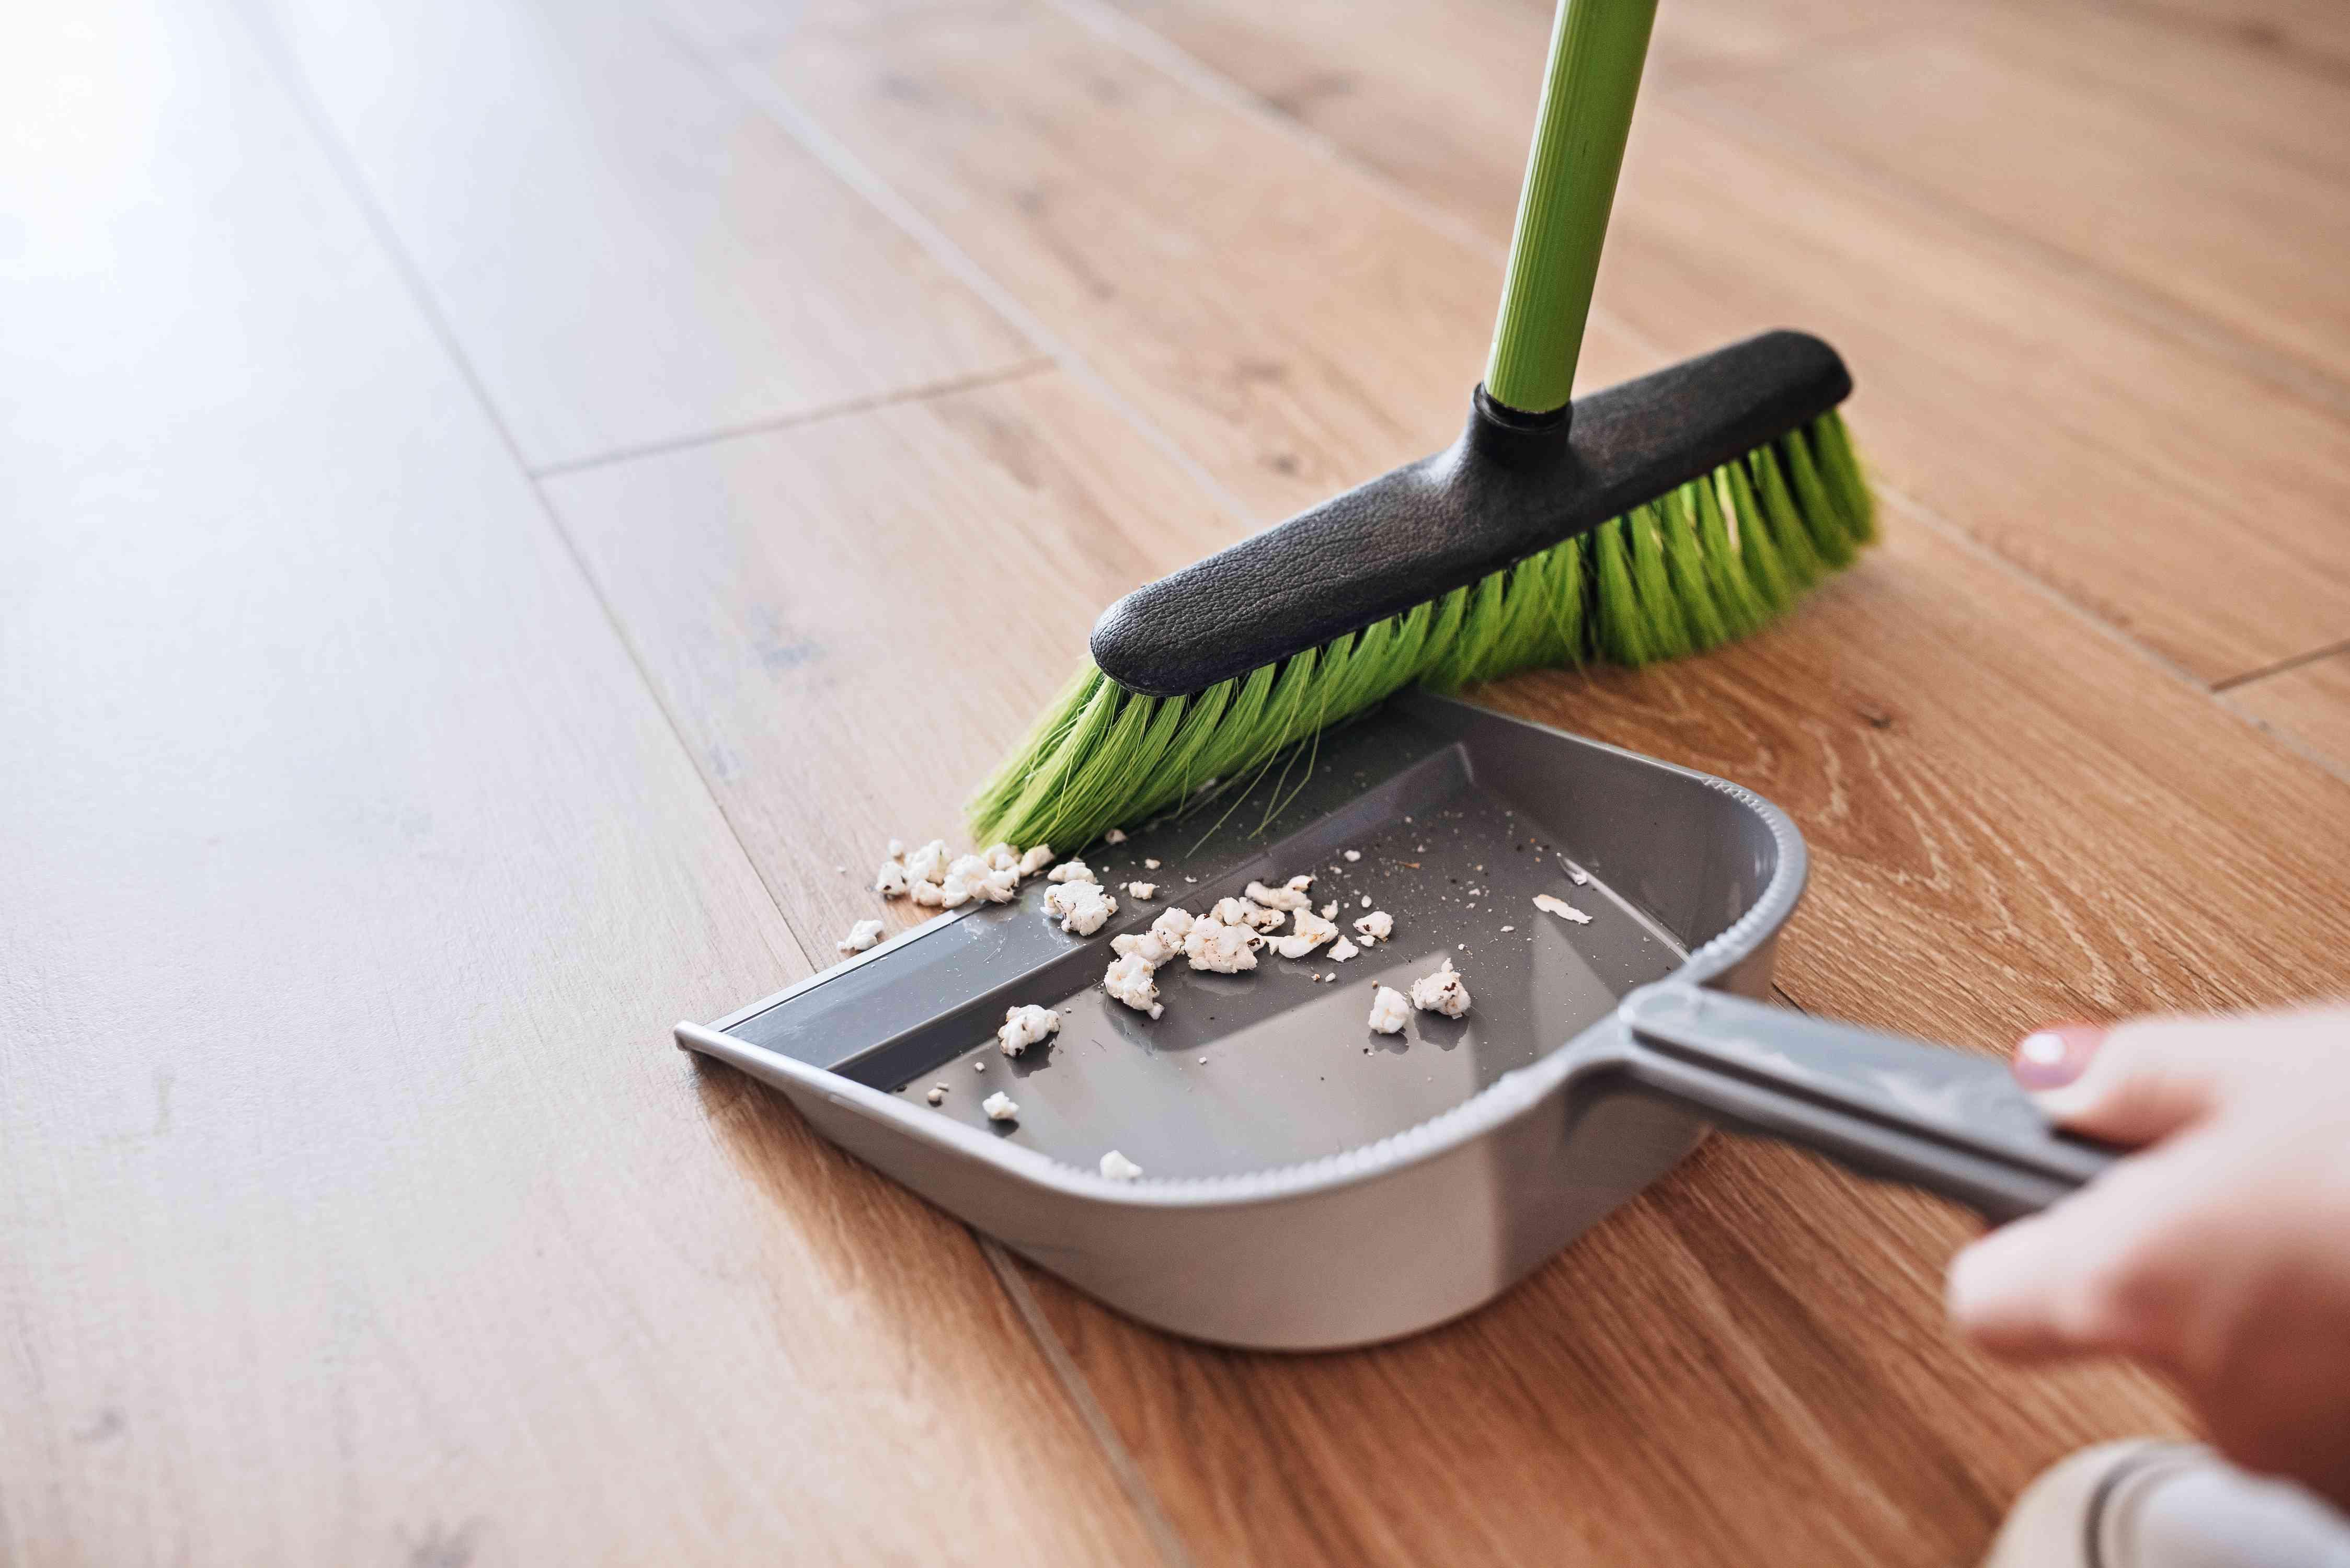 Green broom sweeping up white debris in gray dustpan